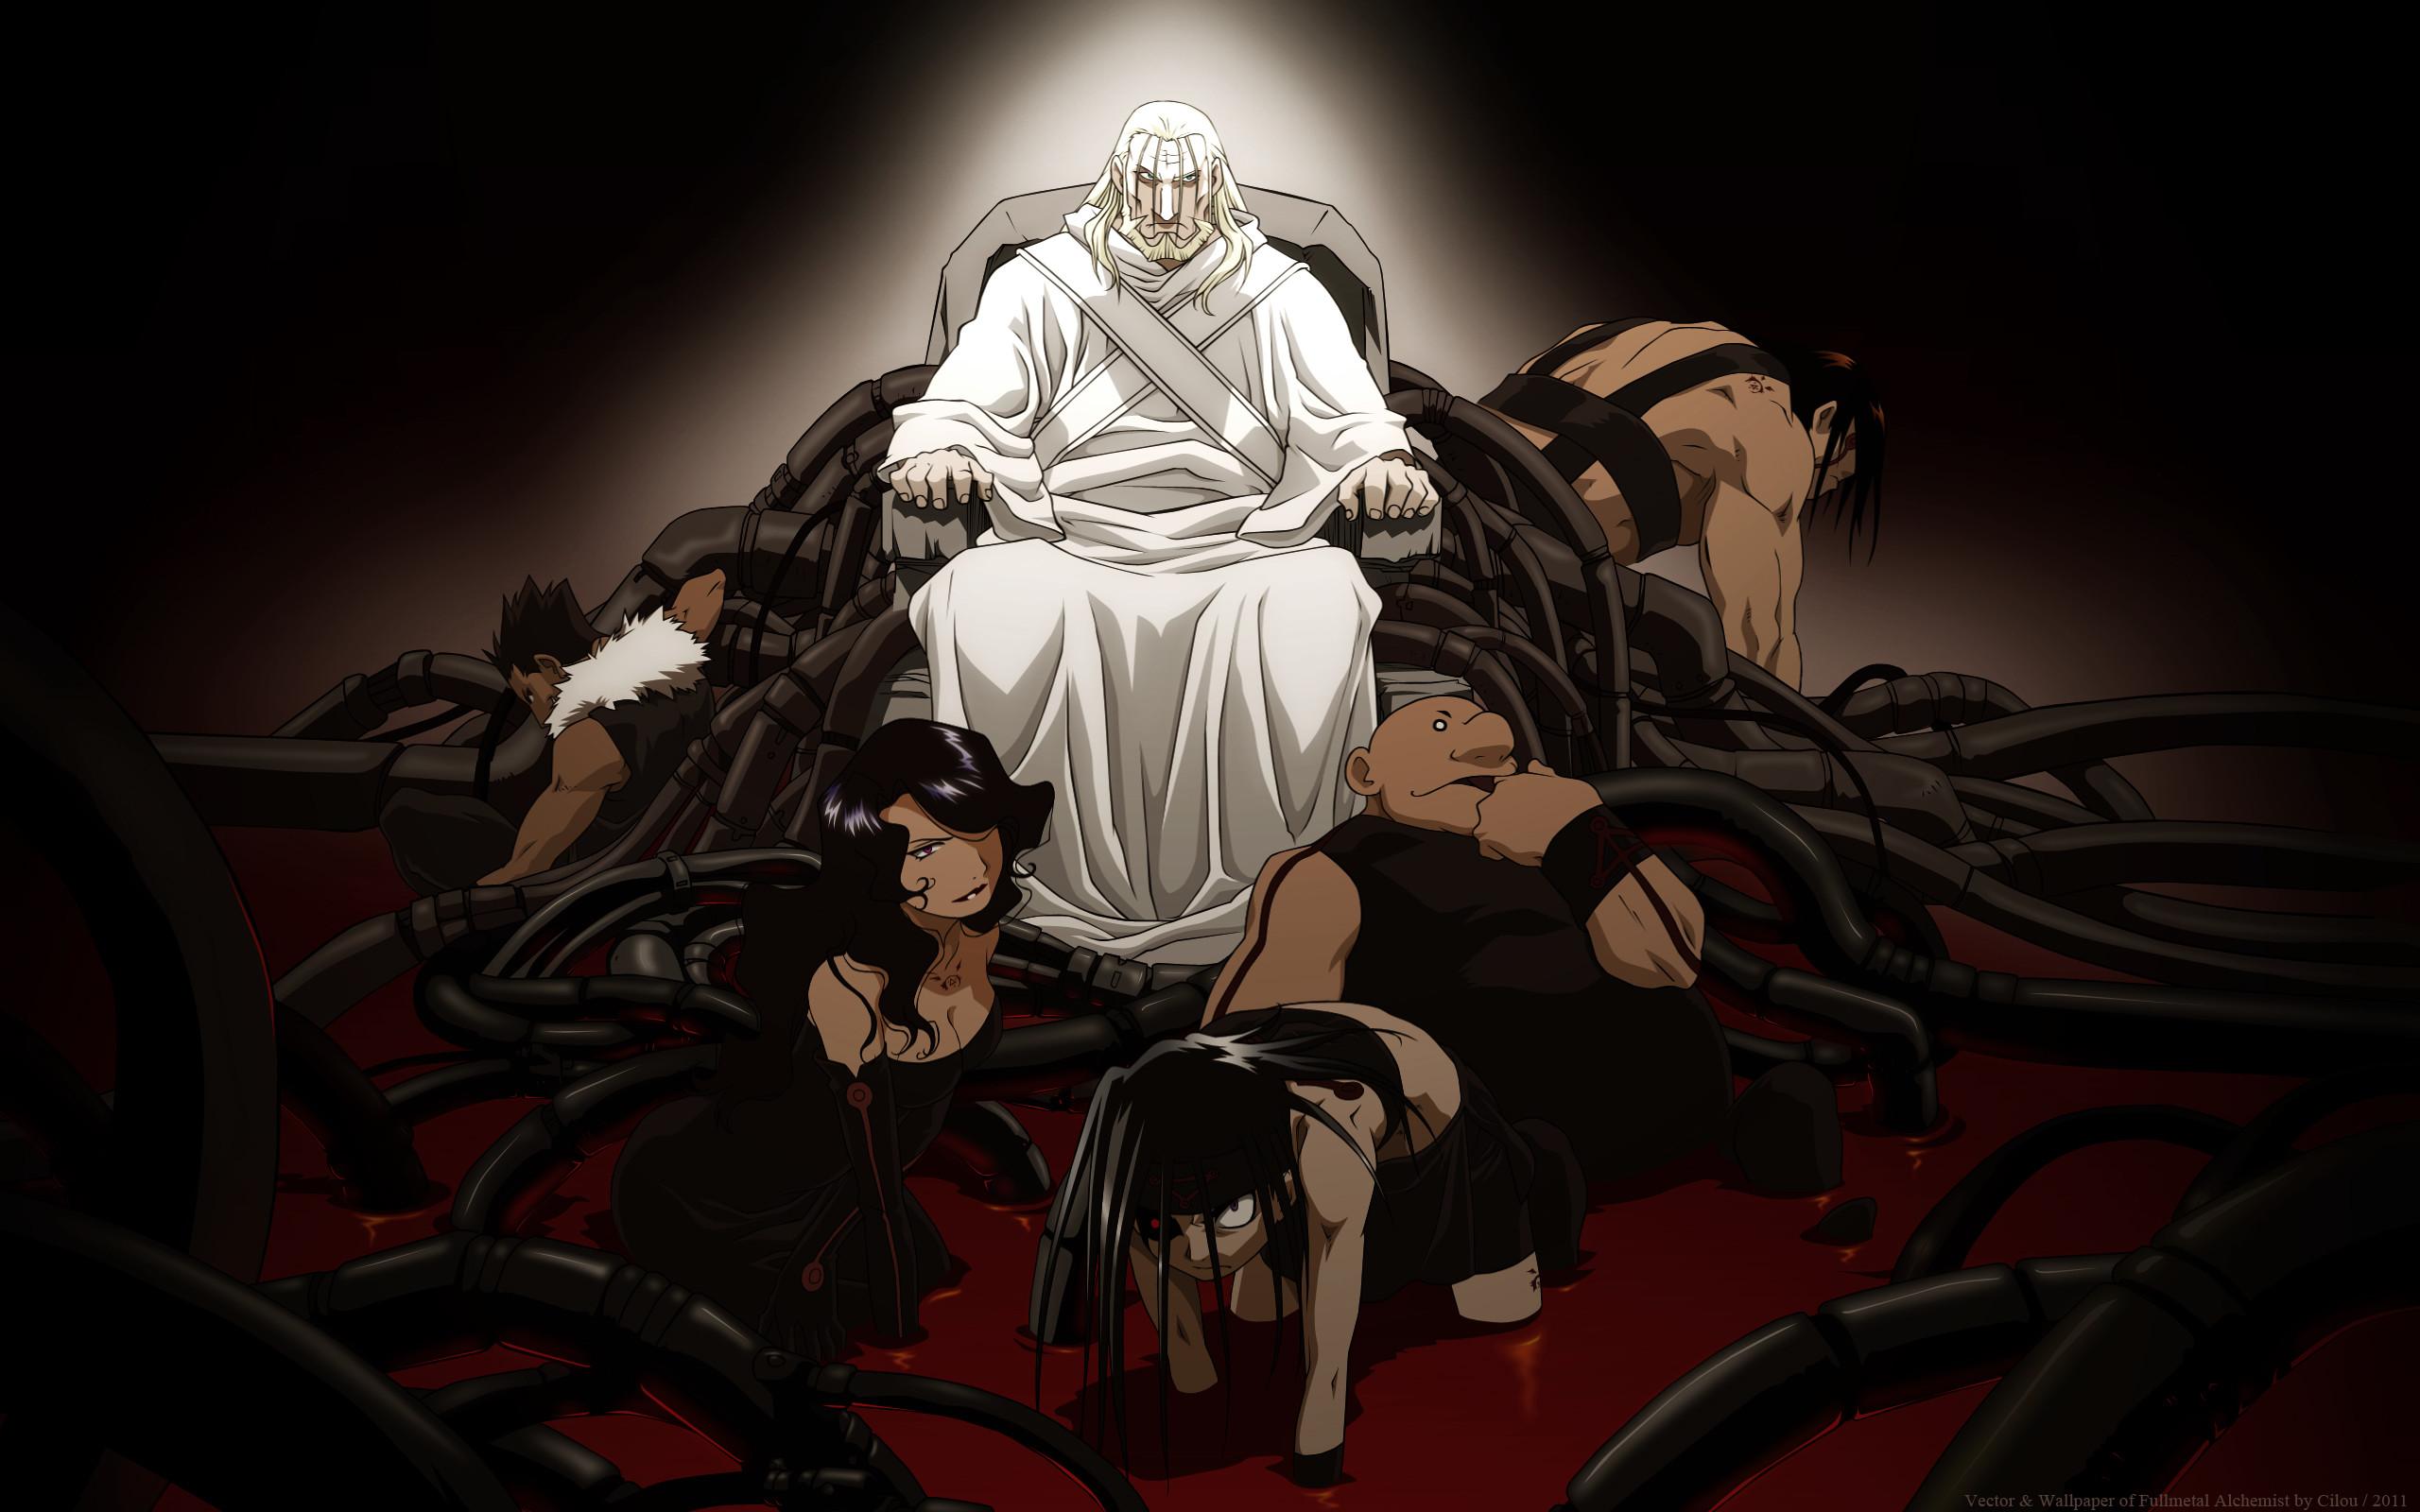 1080x1920 Fullmetal Alchemist Edward Elric Anime Lockscreen Wallpaper Wallpapers Background Backgrounds Iphone